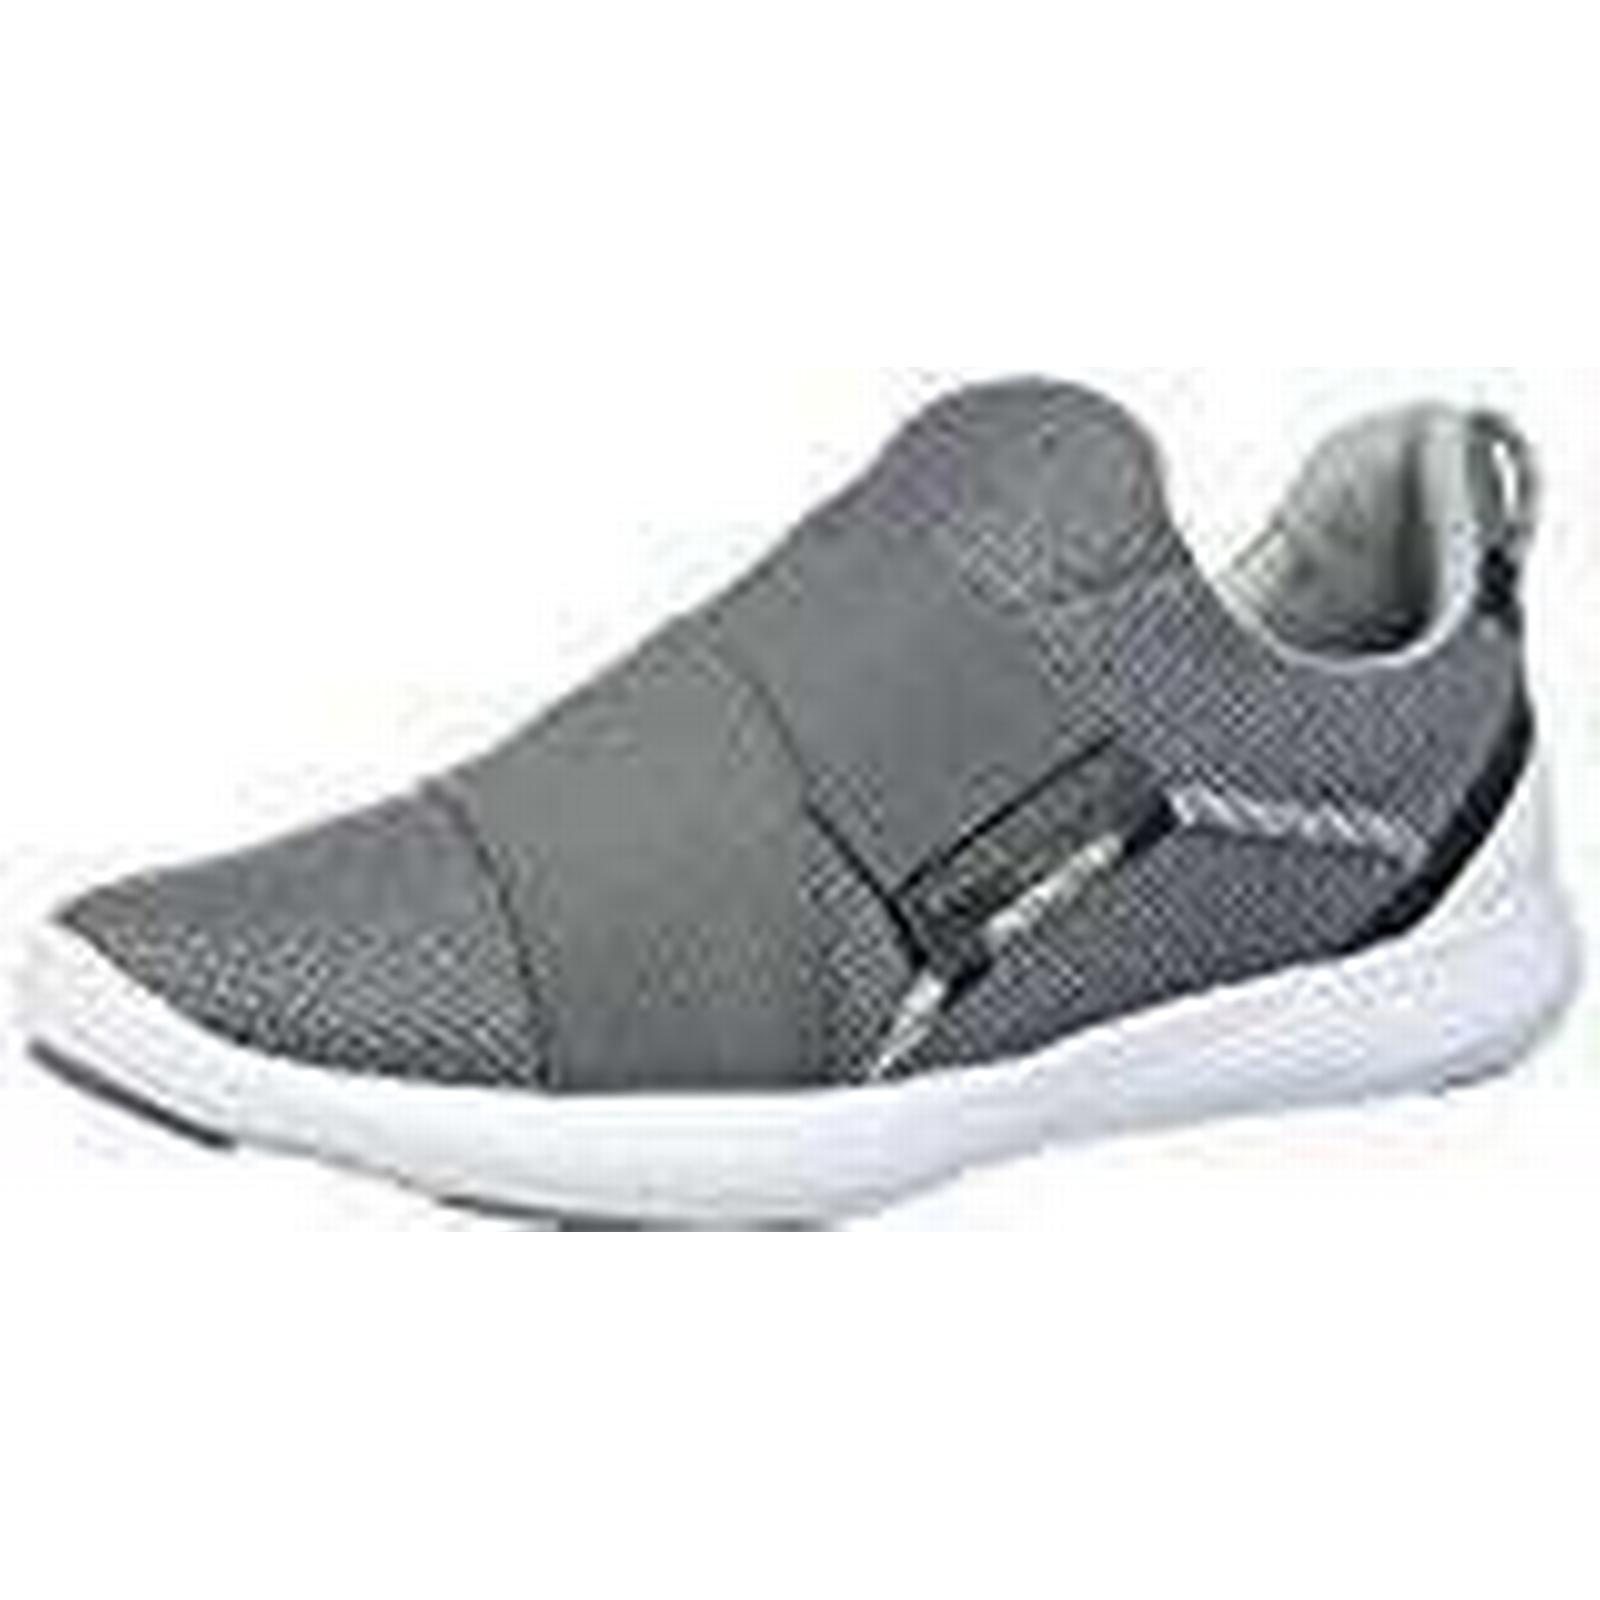 Under Armour Women's UA W Precision (Zinc X Fitness Shoes, Grey (Zinc Precision Gray 102), 6 UK 6 UK 260000